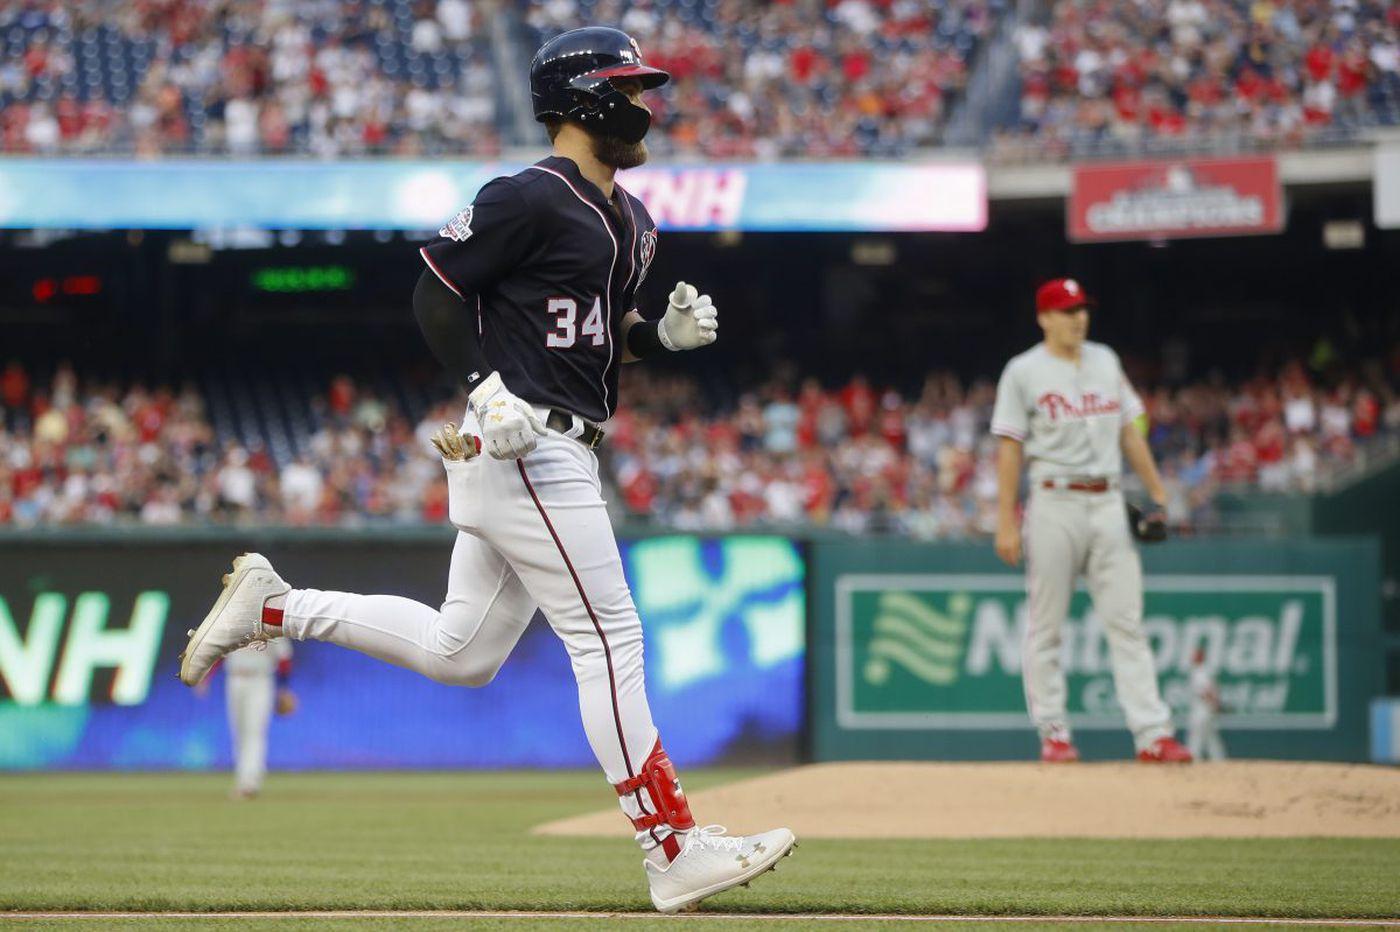 Bryce Harper, Nationals make short work of Nick Pivetta in Phillies' loss